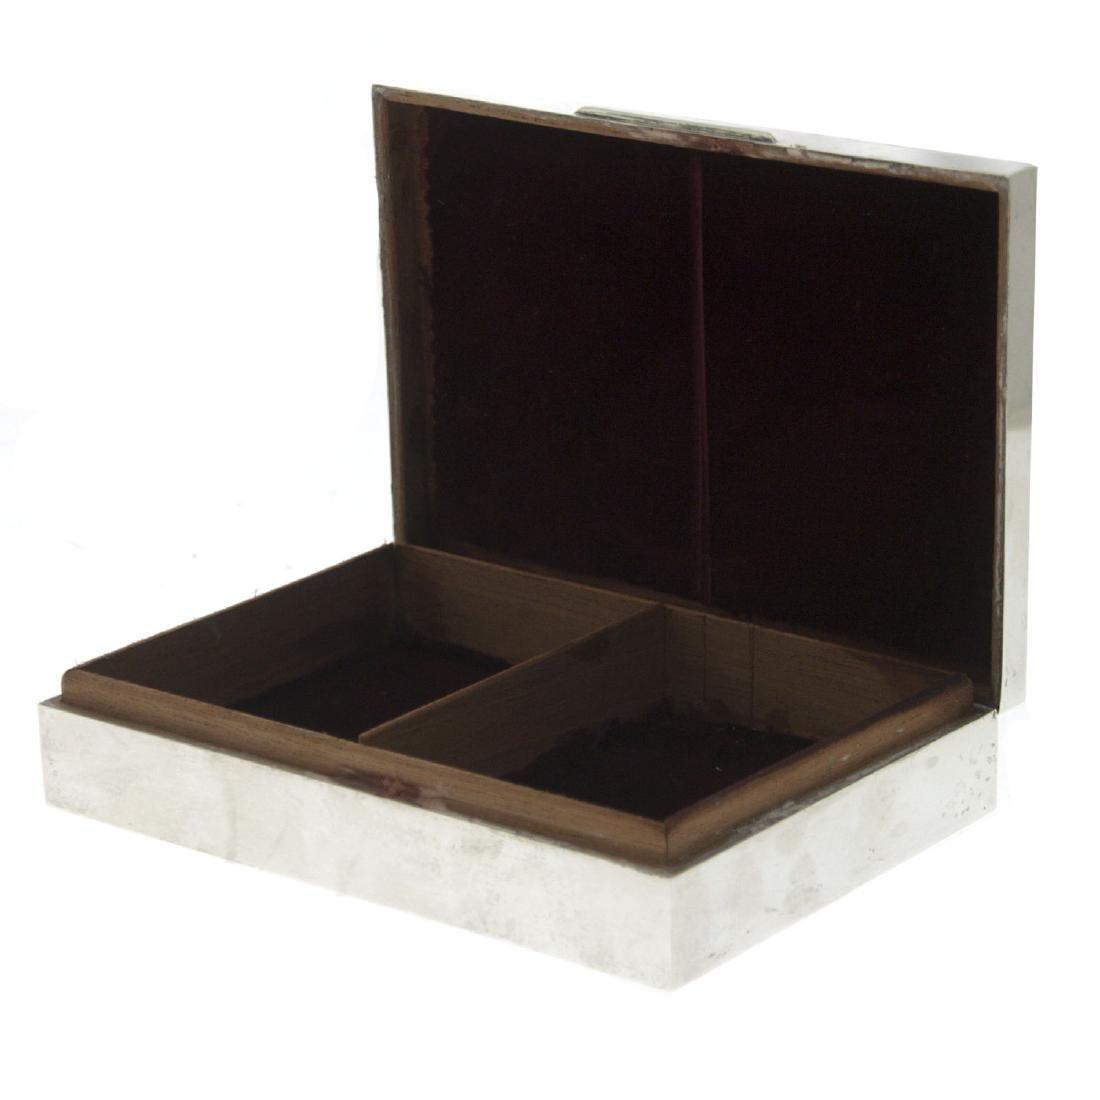 Sterling Silver Cigar Cigarette Case, Harman Brothers, - 2